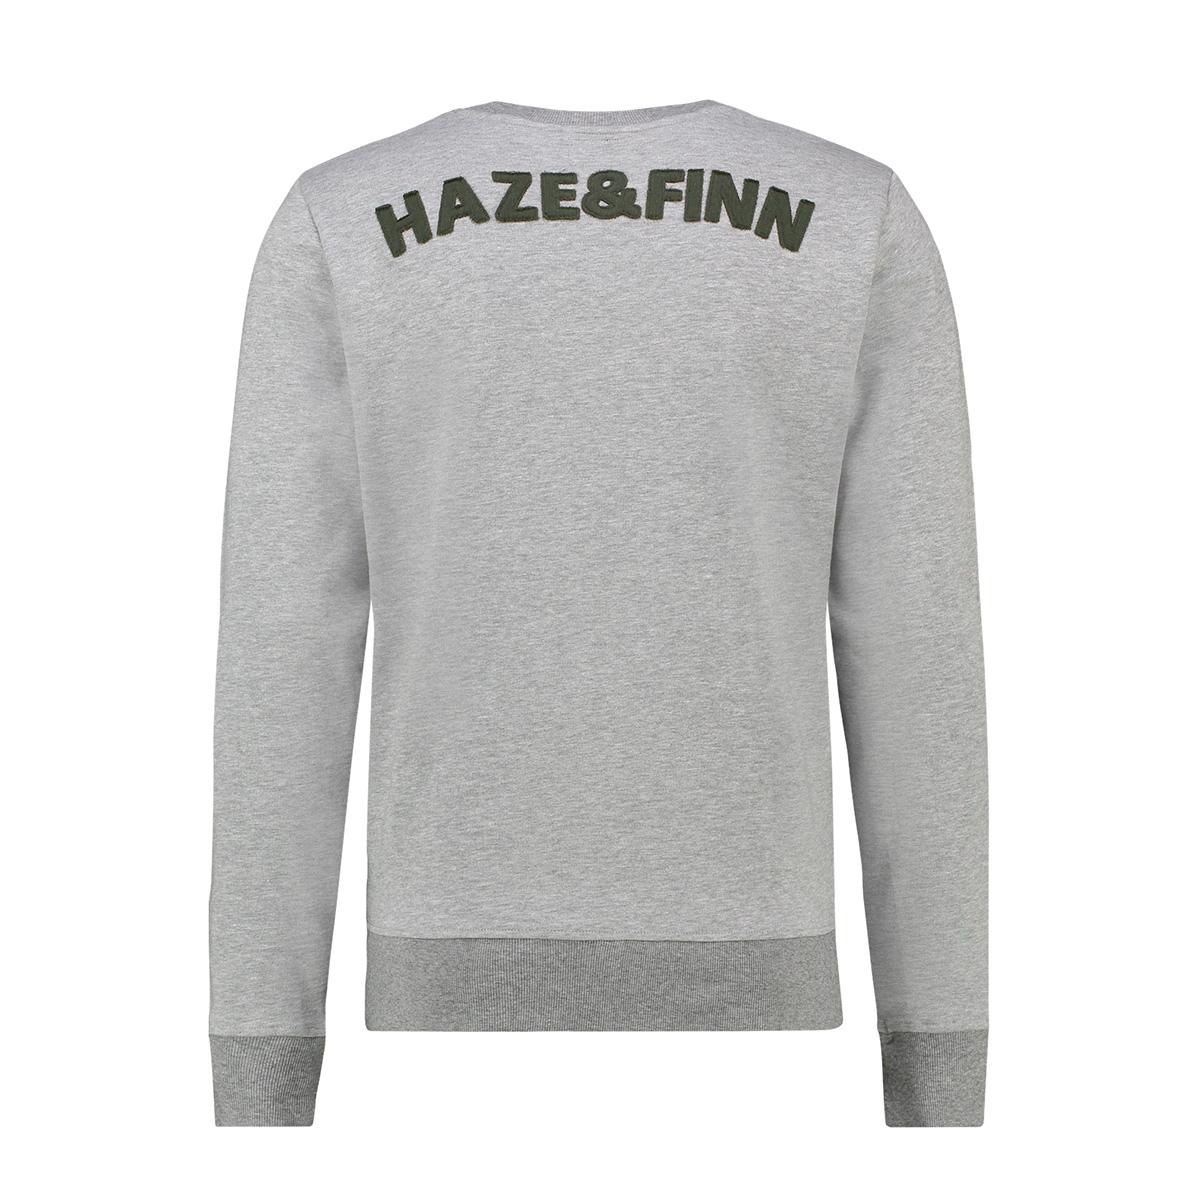 sweat cut out mu13 0402 haze & finn sweater lgm/army